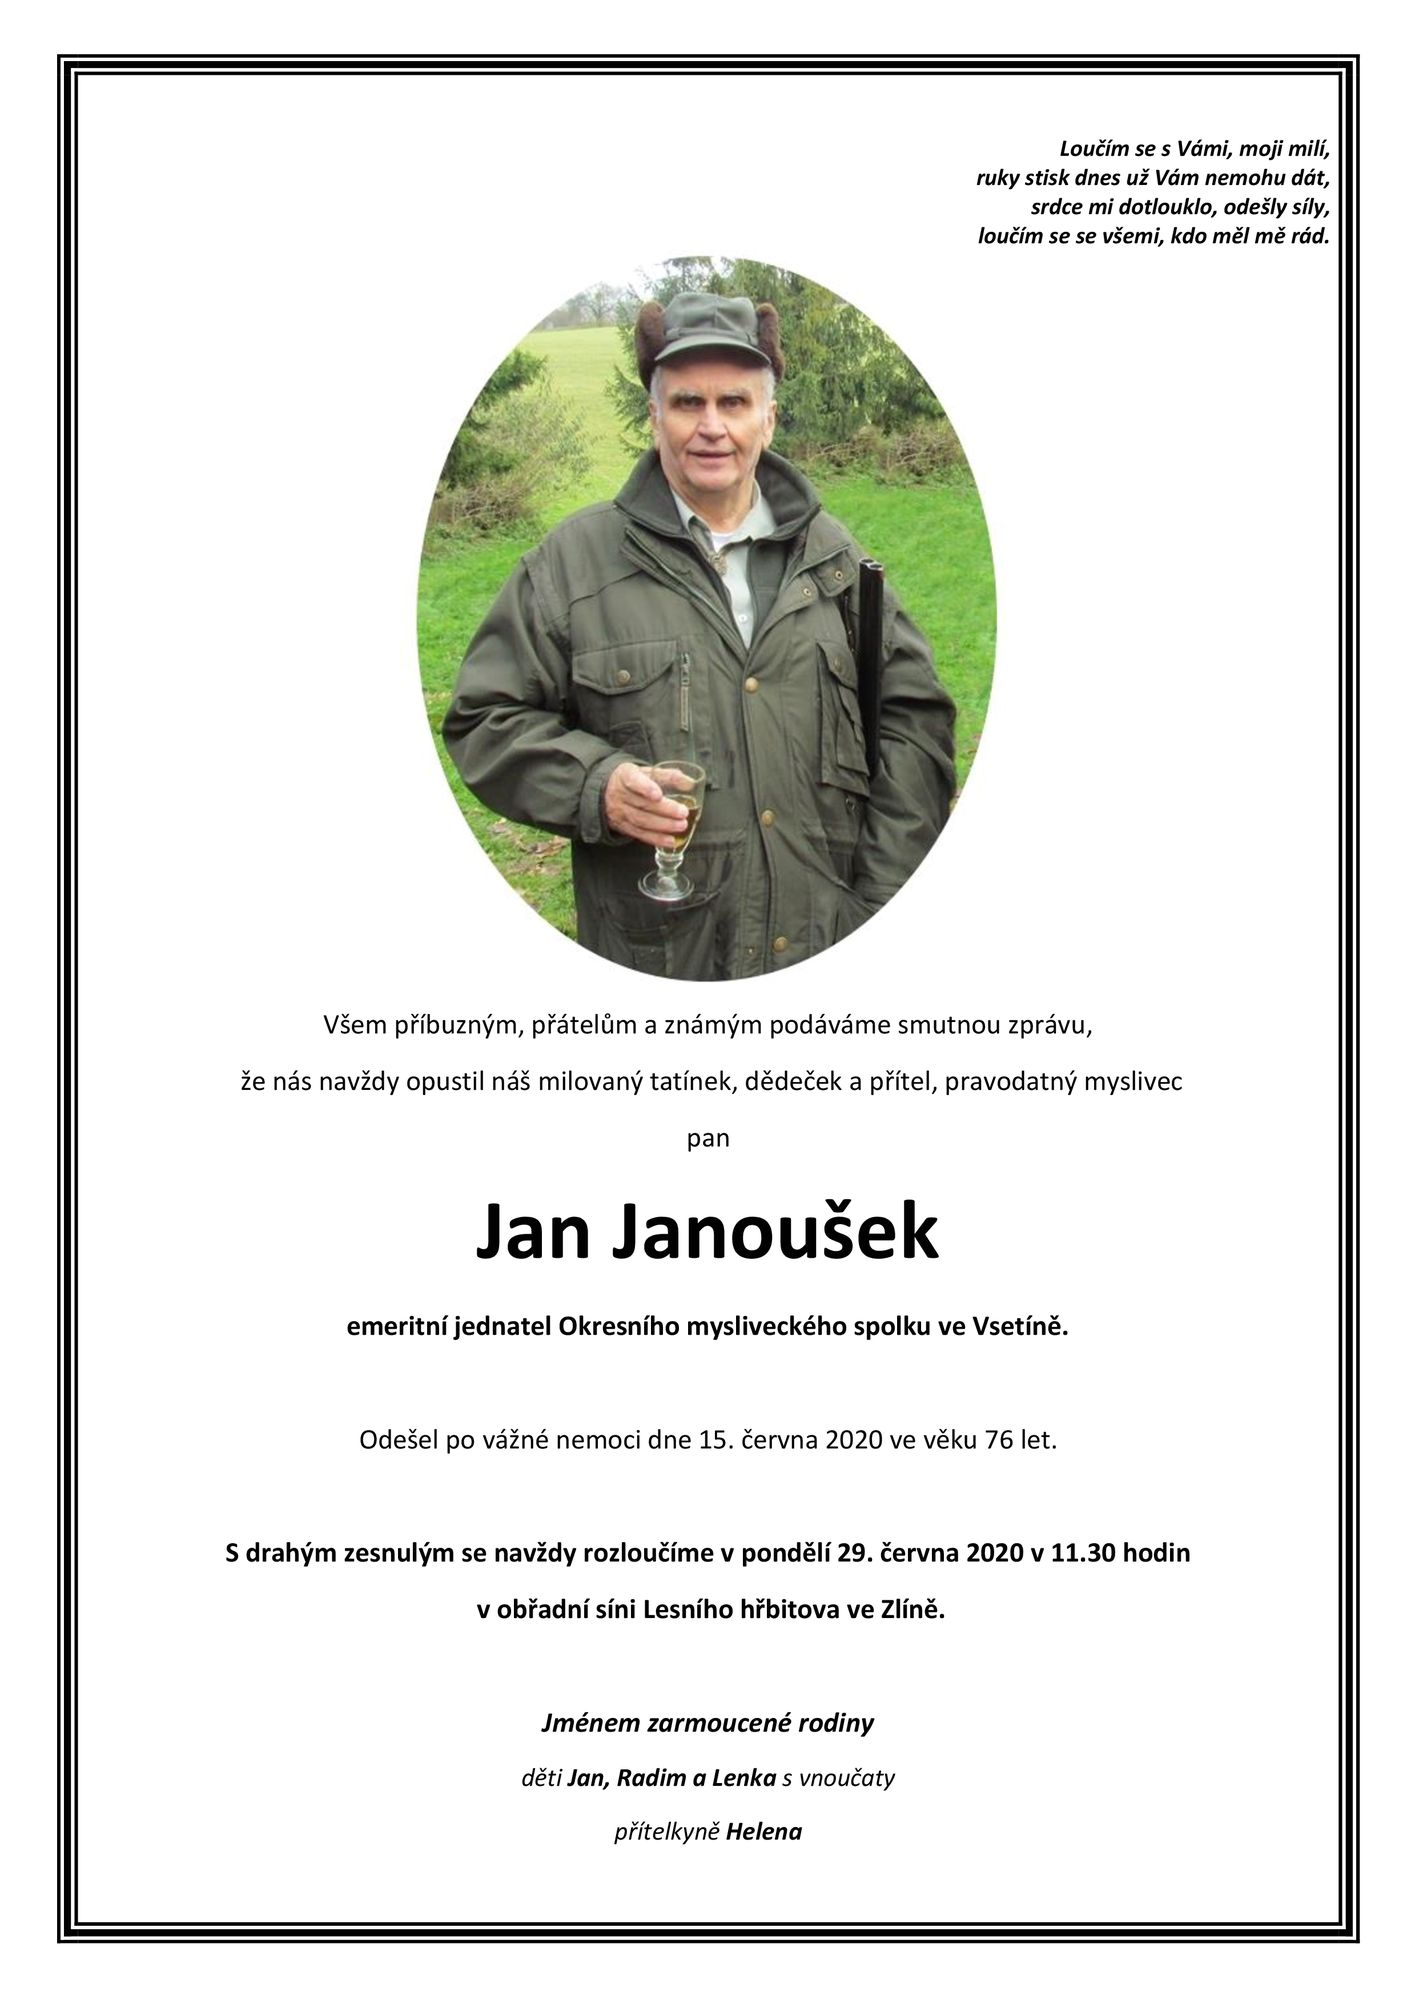 Jan Janoušek